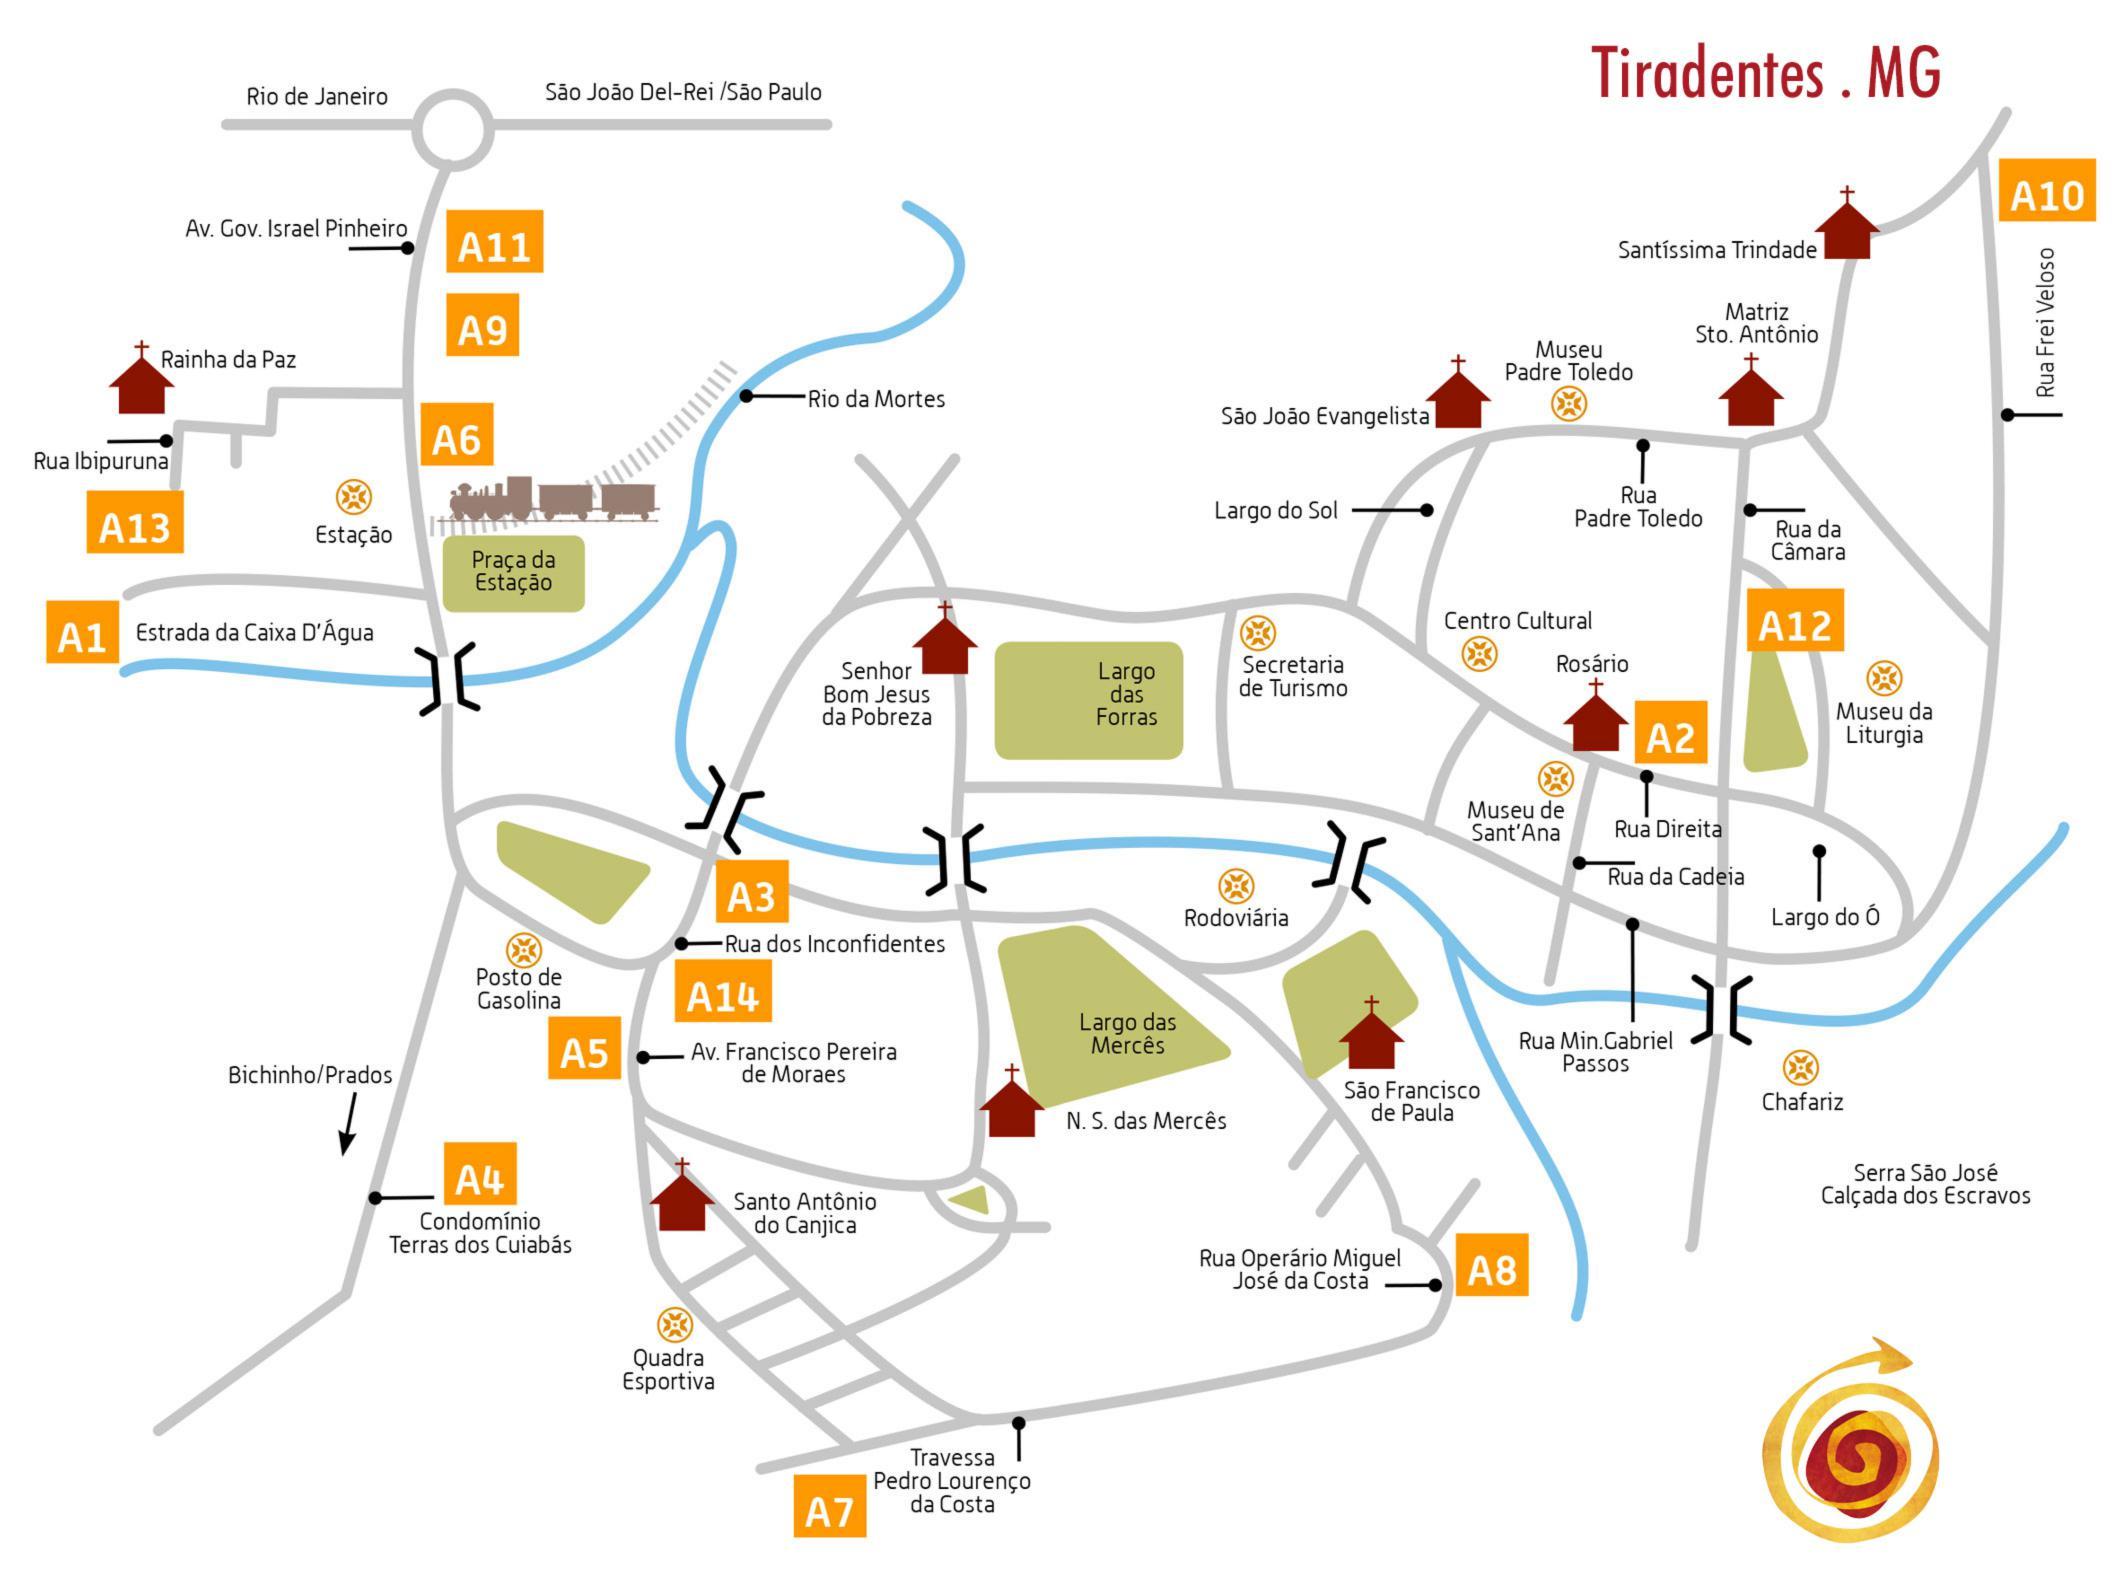 Mapa Rota dos Ateliers, Passeios imperdíveis em Tiradentes